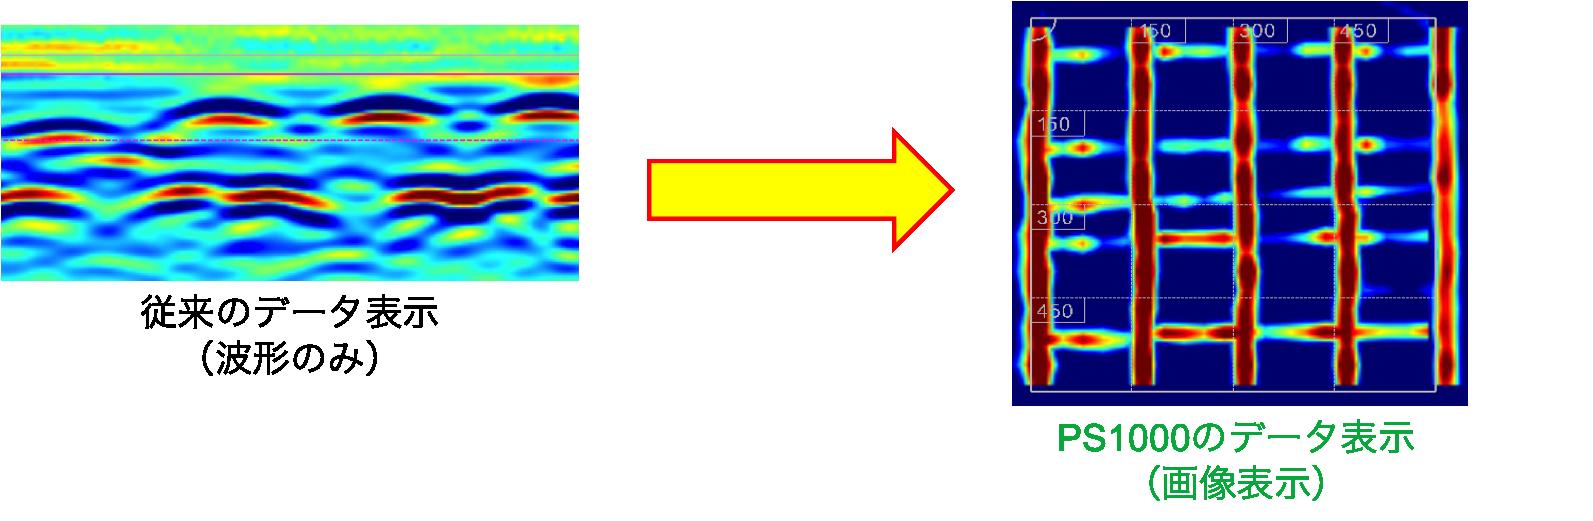 x-scan ps1000画像faq3_1